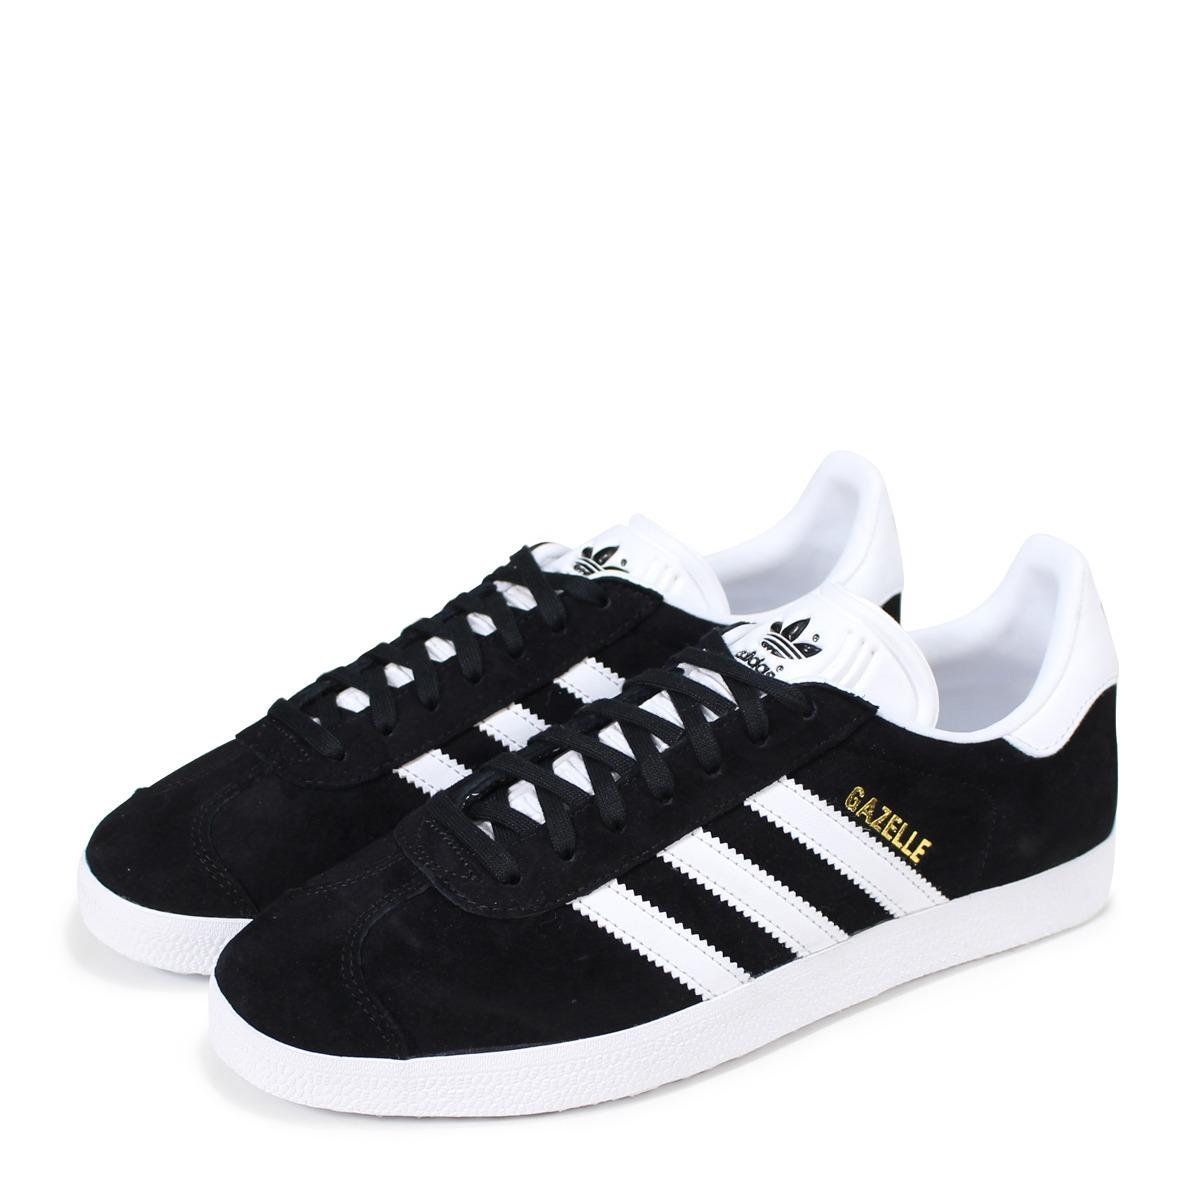 buy popular f7e91 02ceb zapatillas adidas gazelle negras en rangers. Cargando zoom.